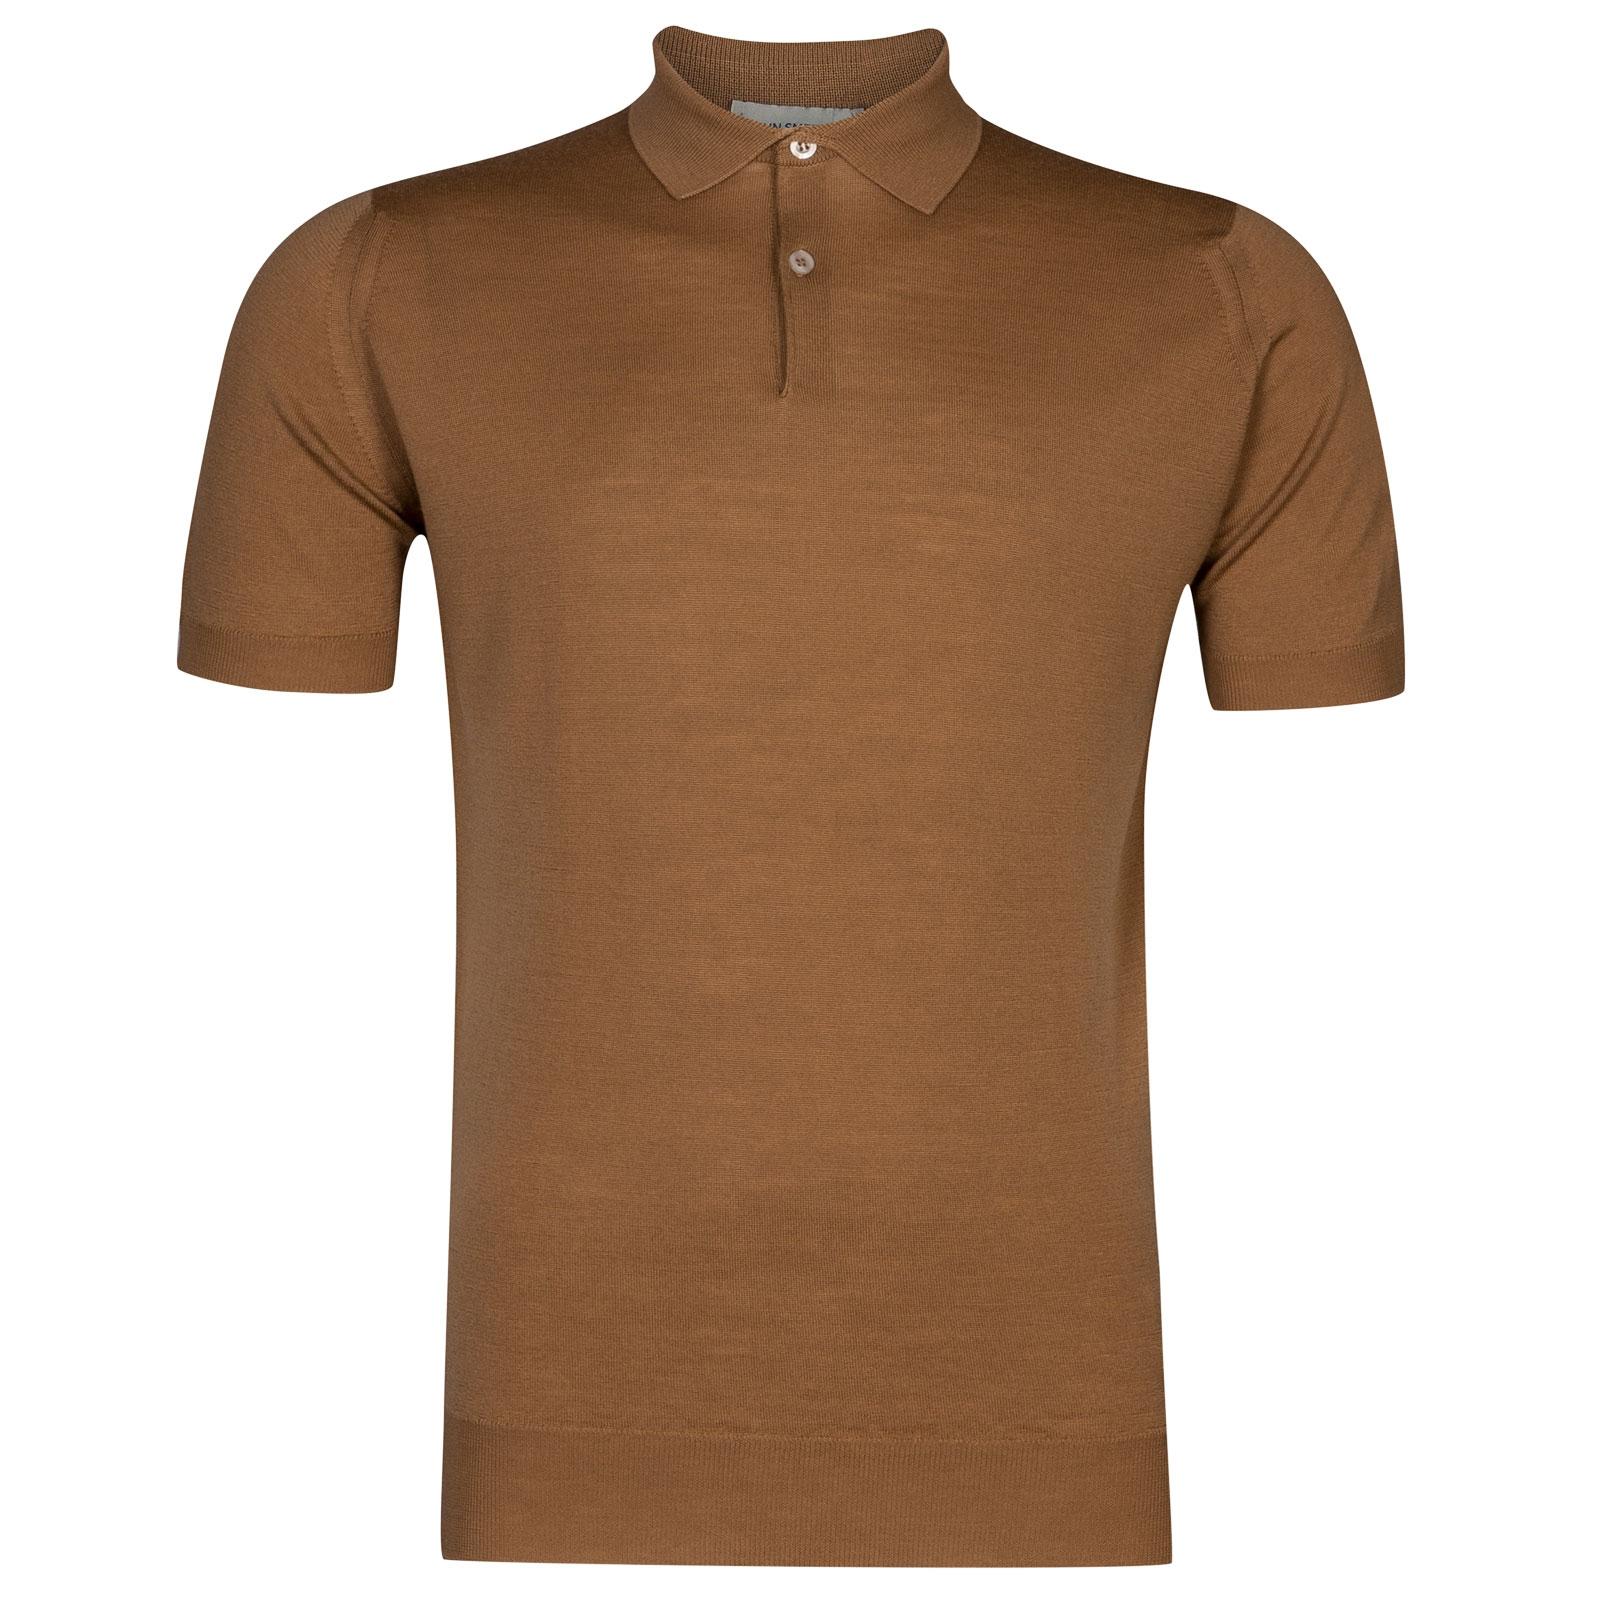 John Smedley Payton in Camel Shirt-XXL